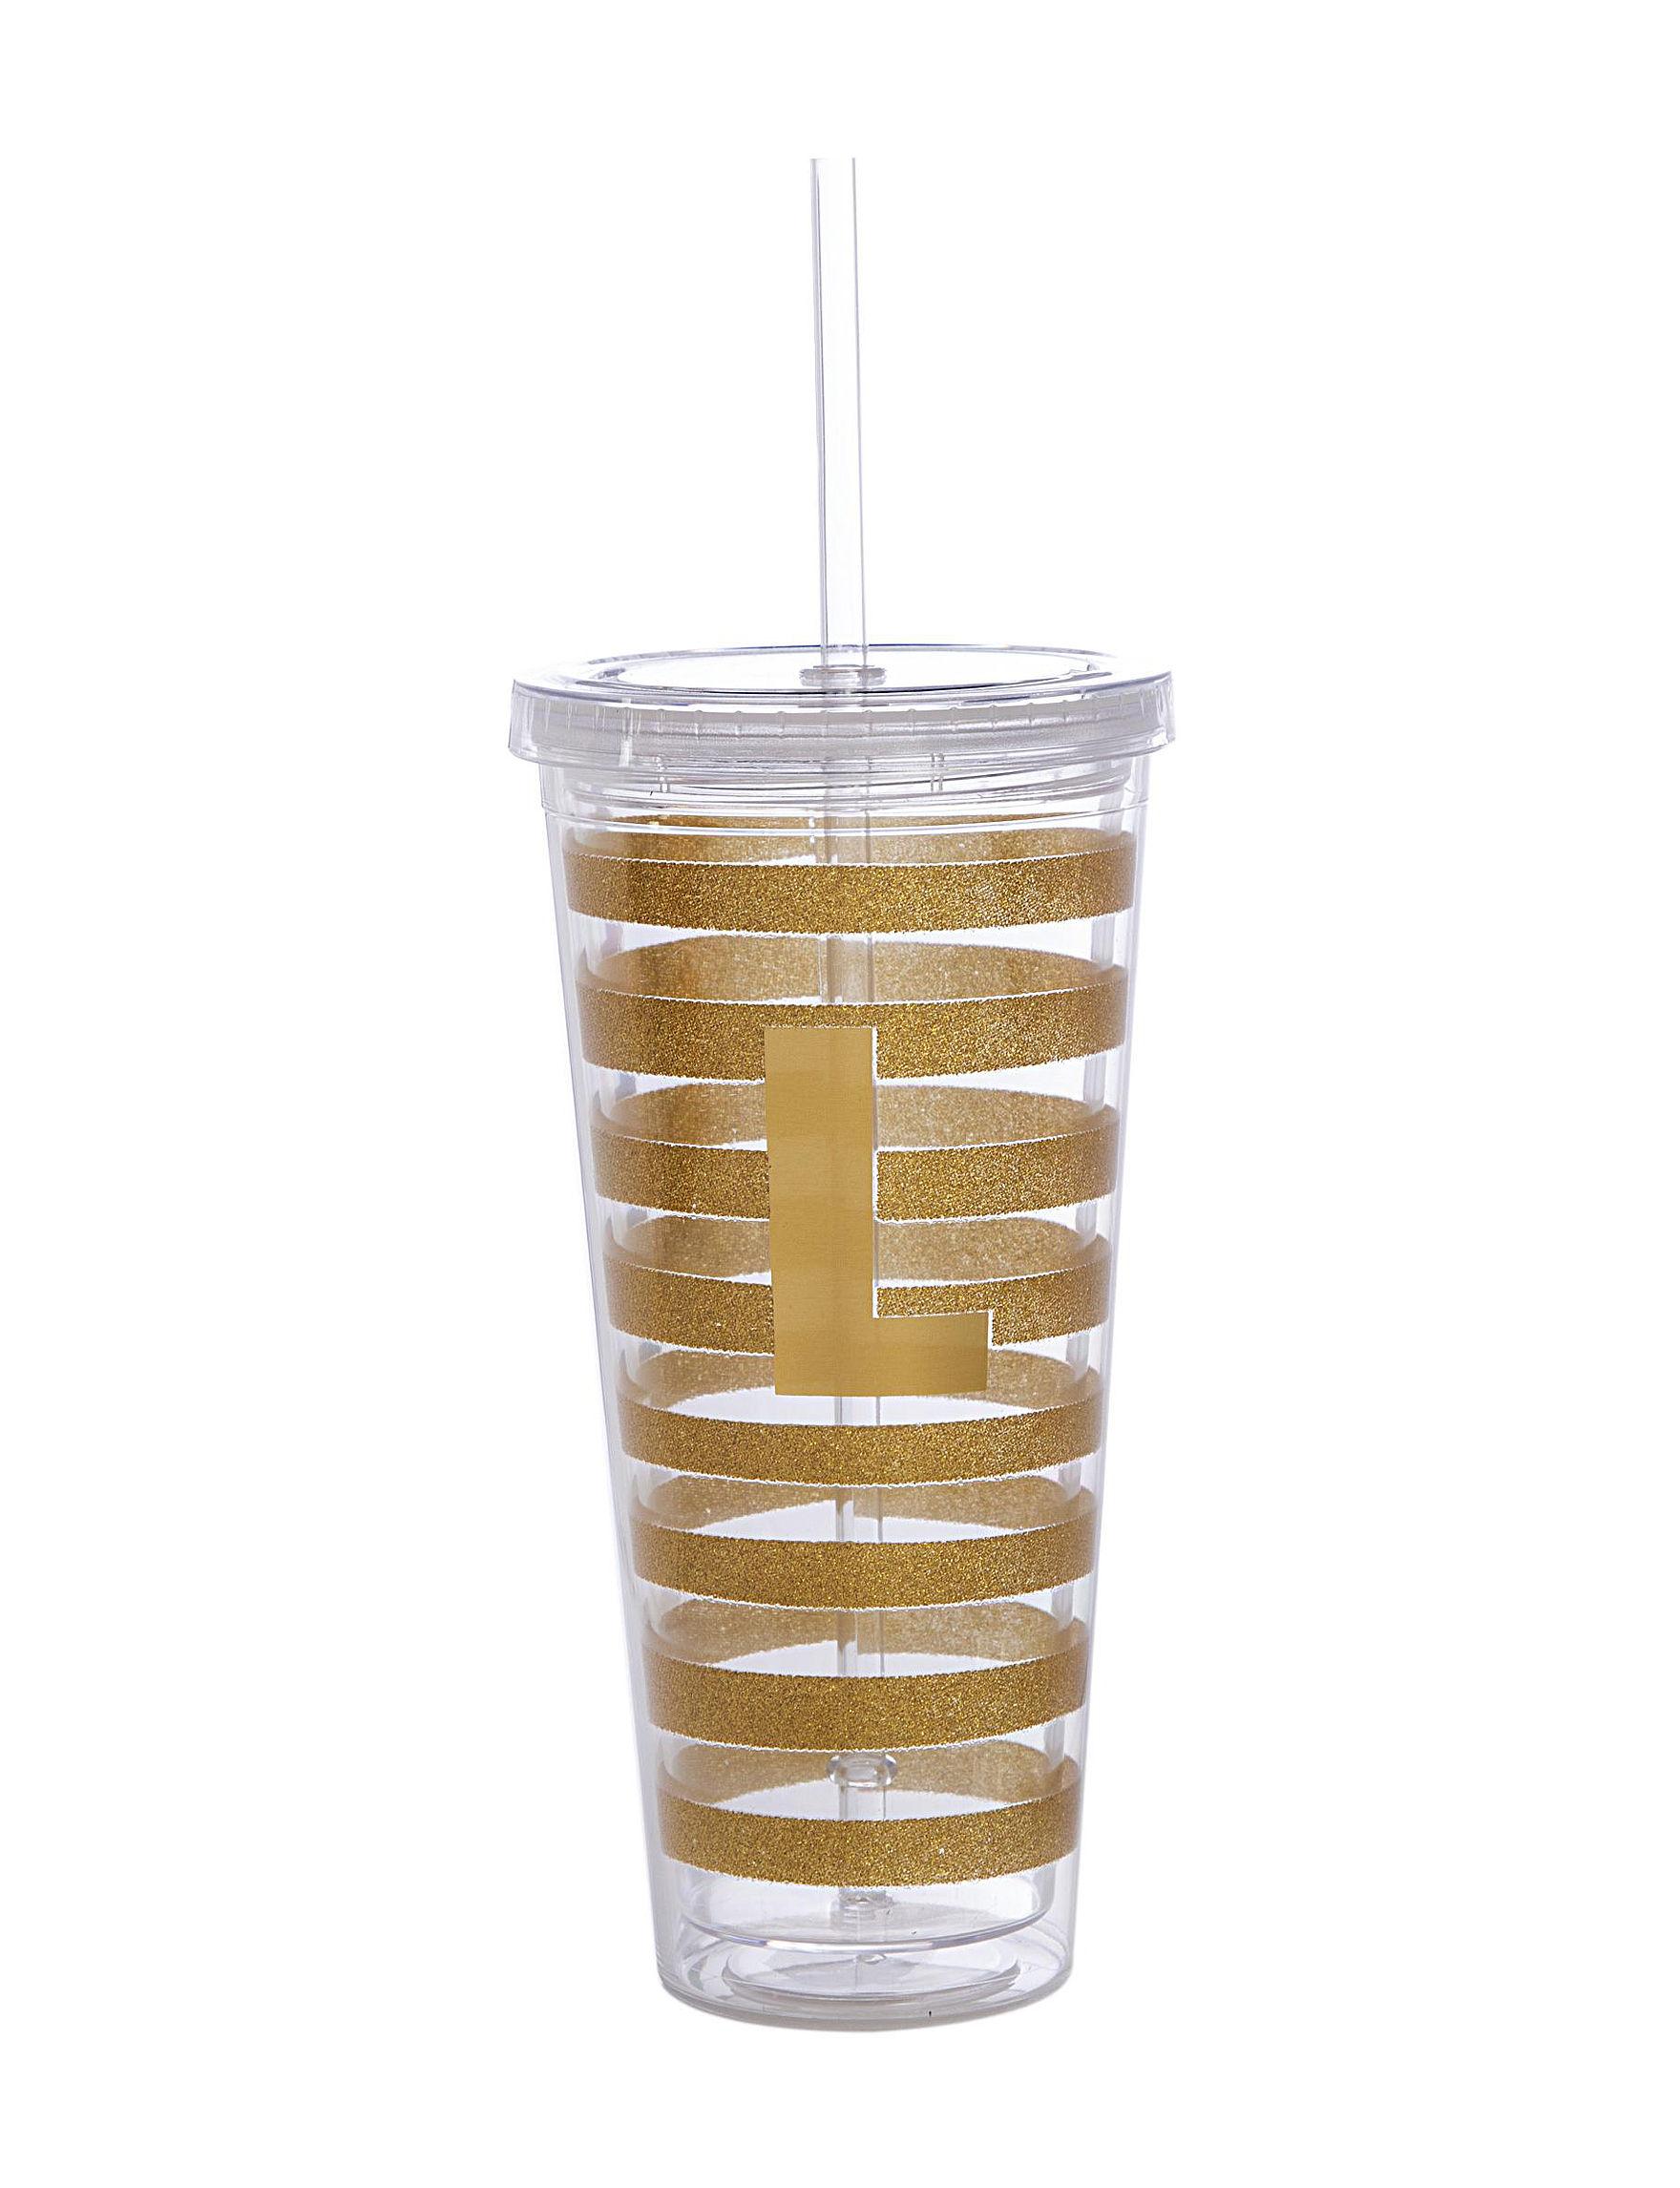 Formation Black Everyday Cups & Glasses Monogram Drinkware